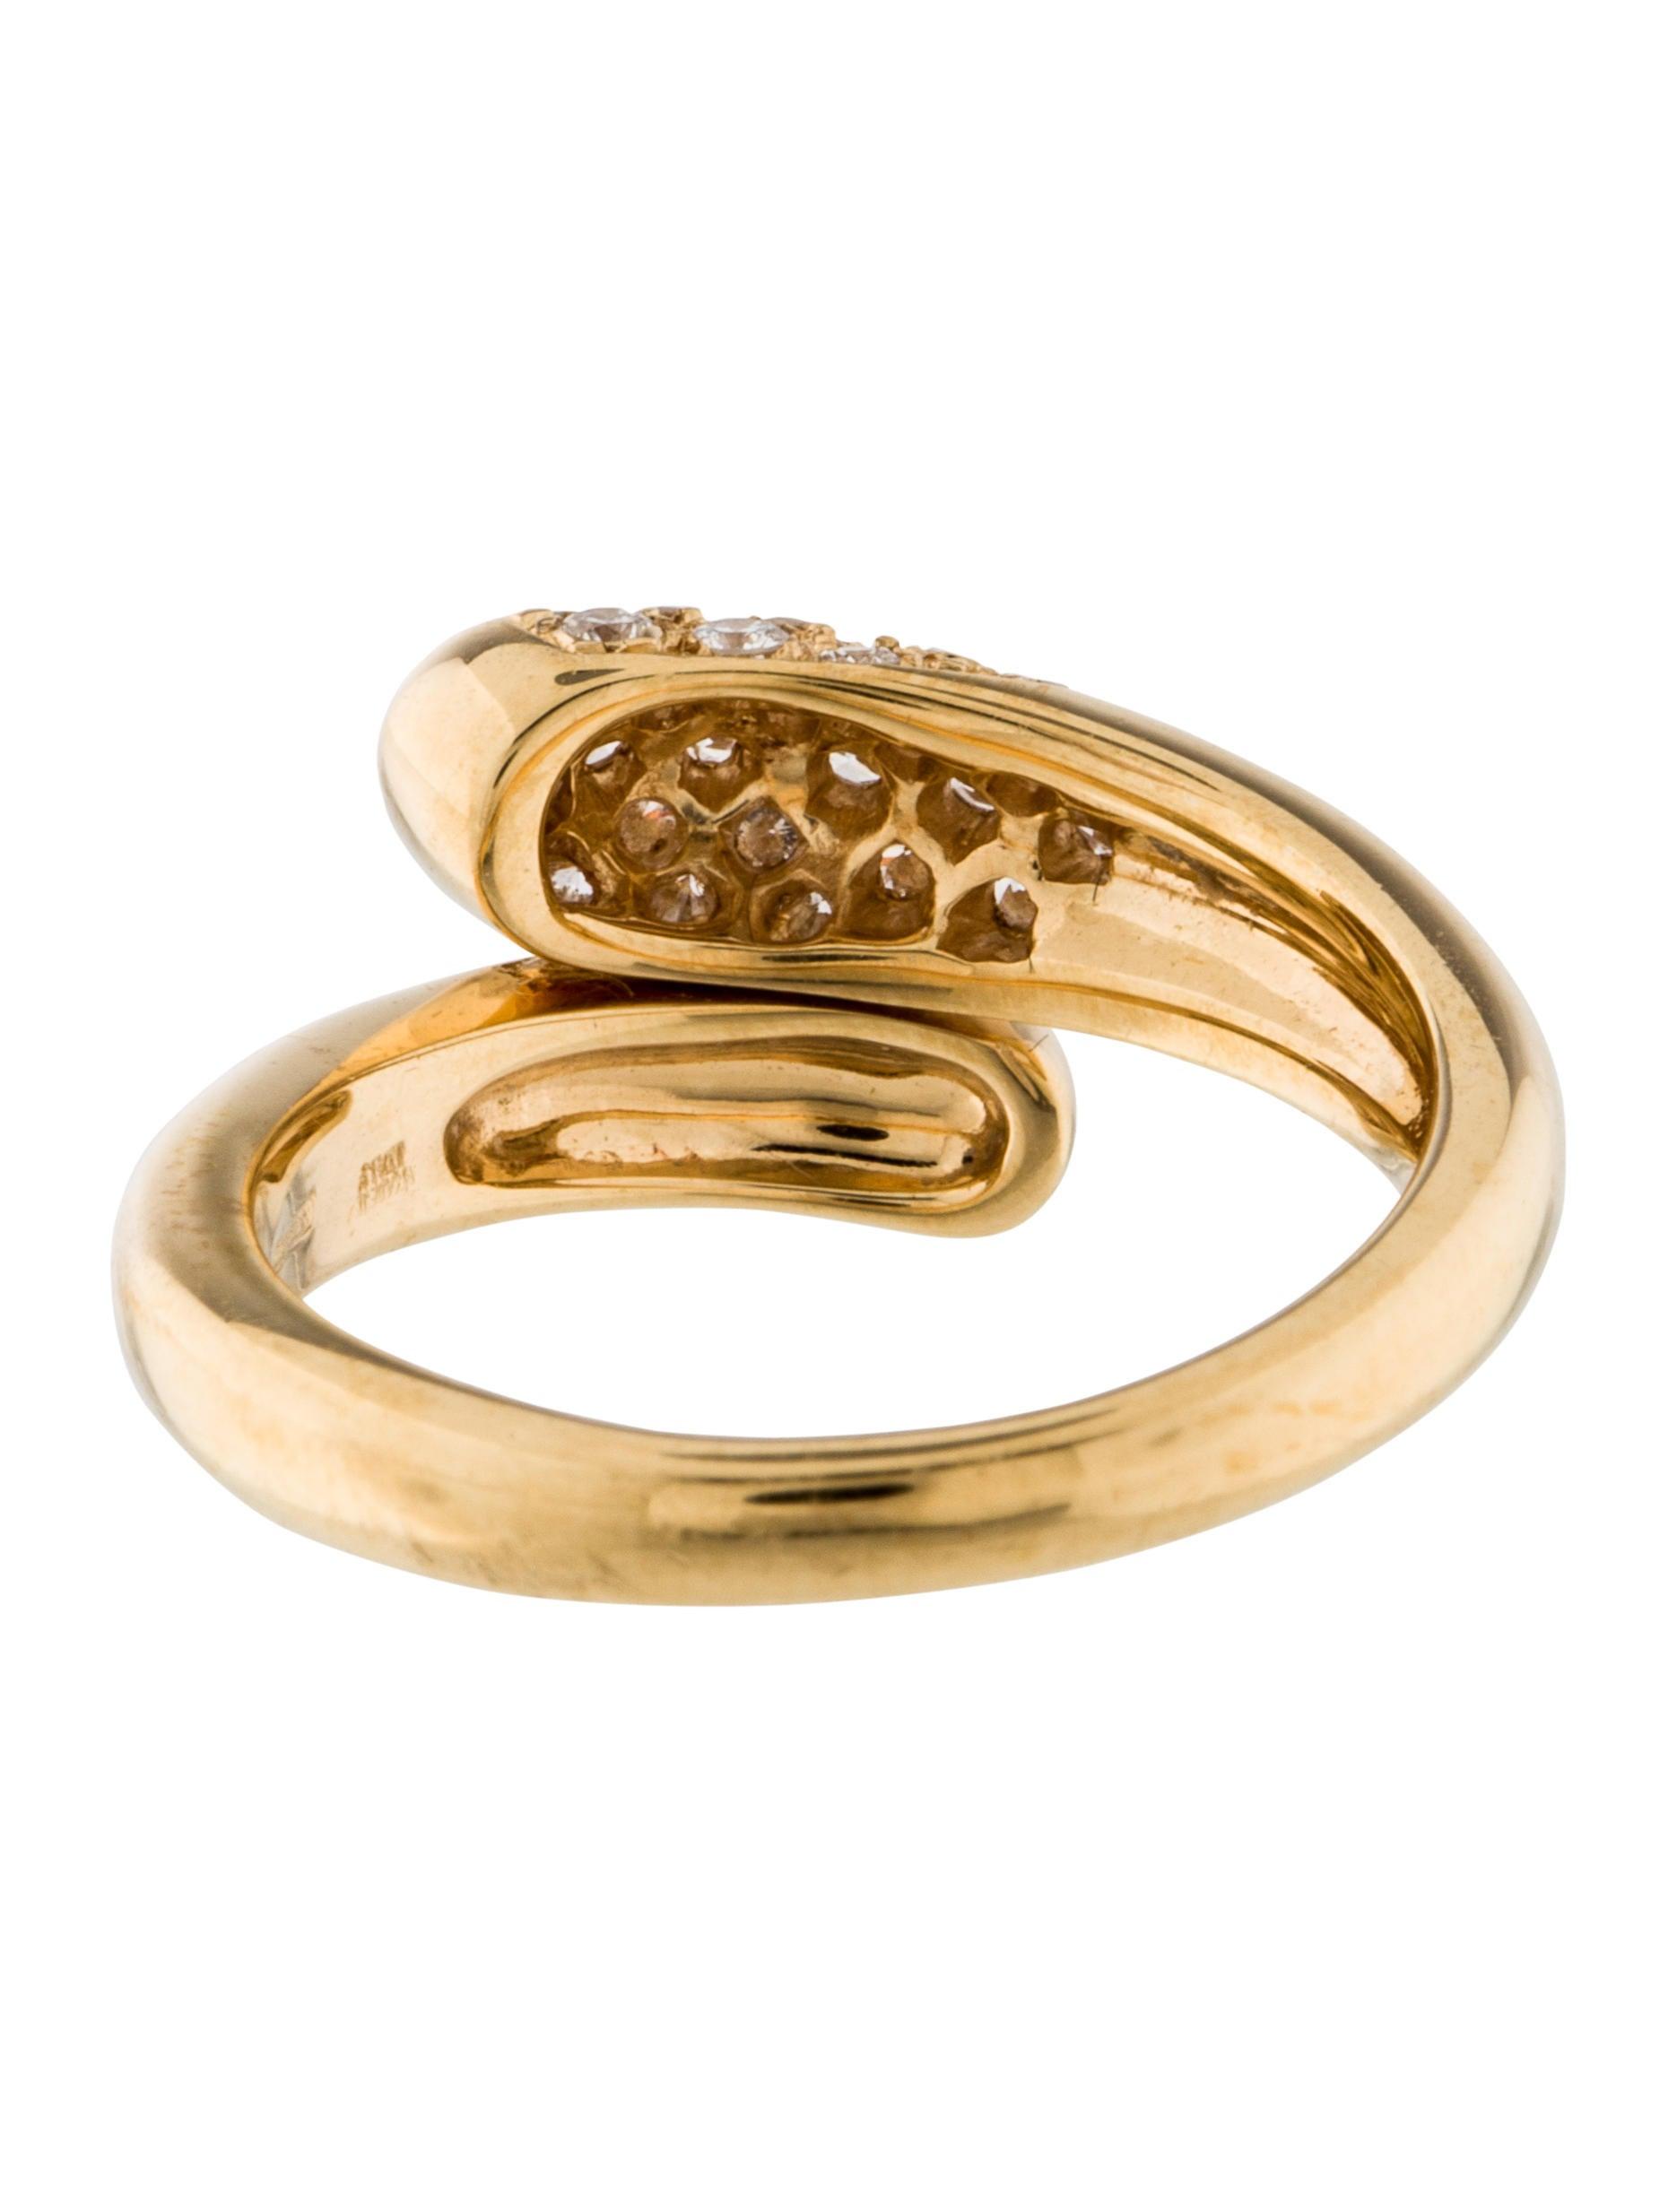 bvlgari 18k bypass ring rings bul25100 the